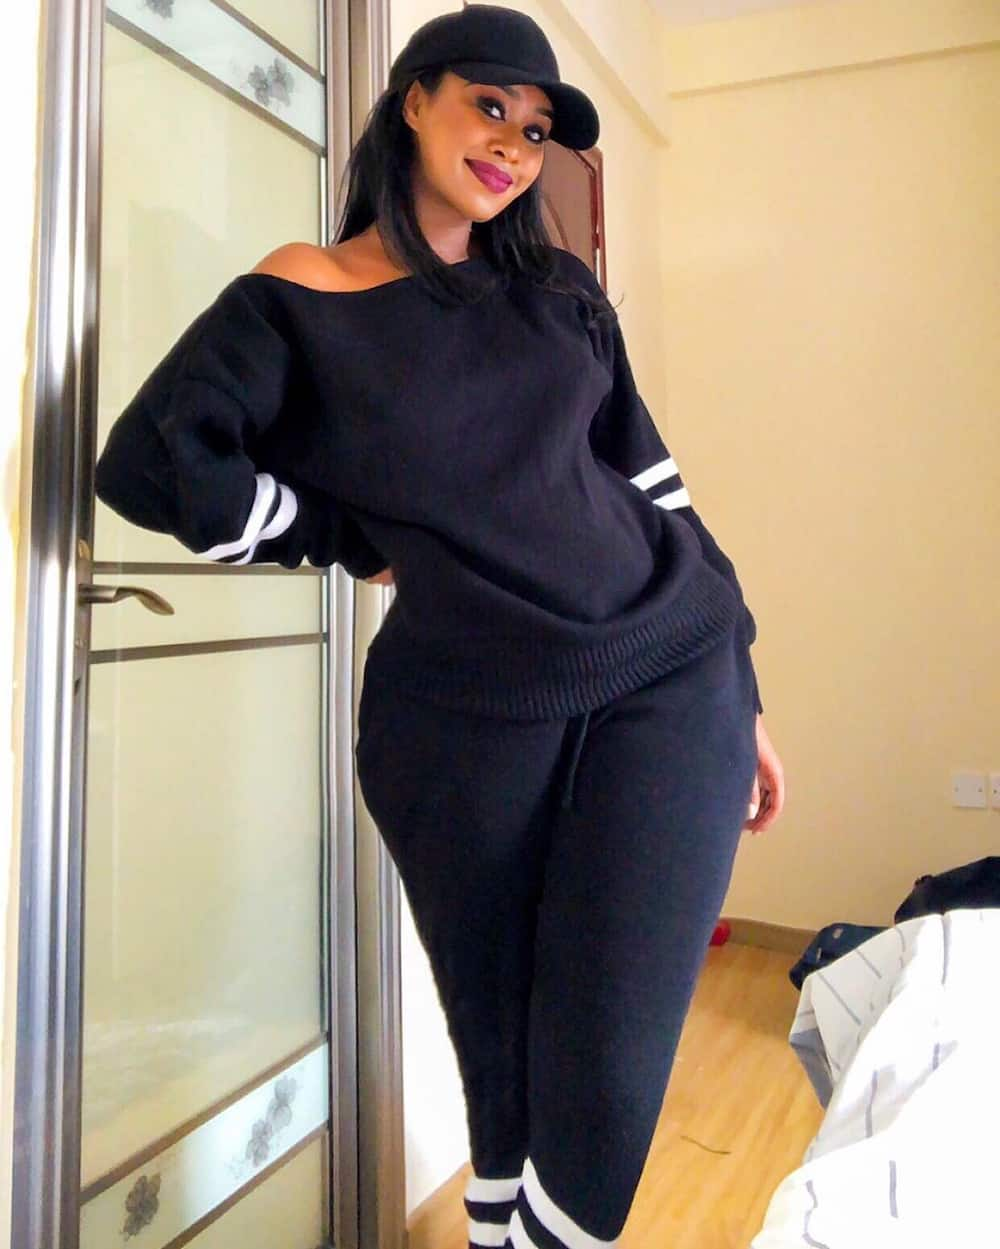 10 cute photos of Otile Brown's Ethiopian girlfriend